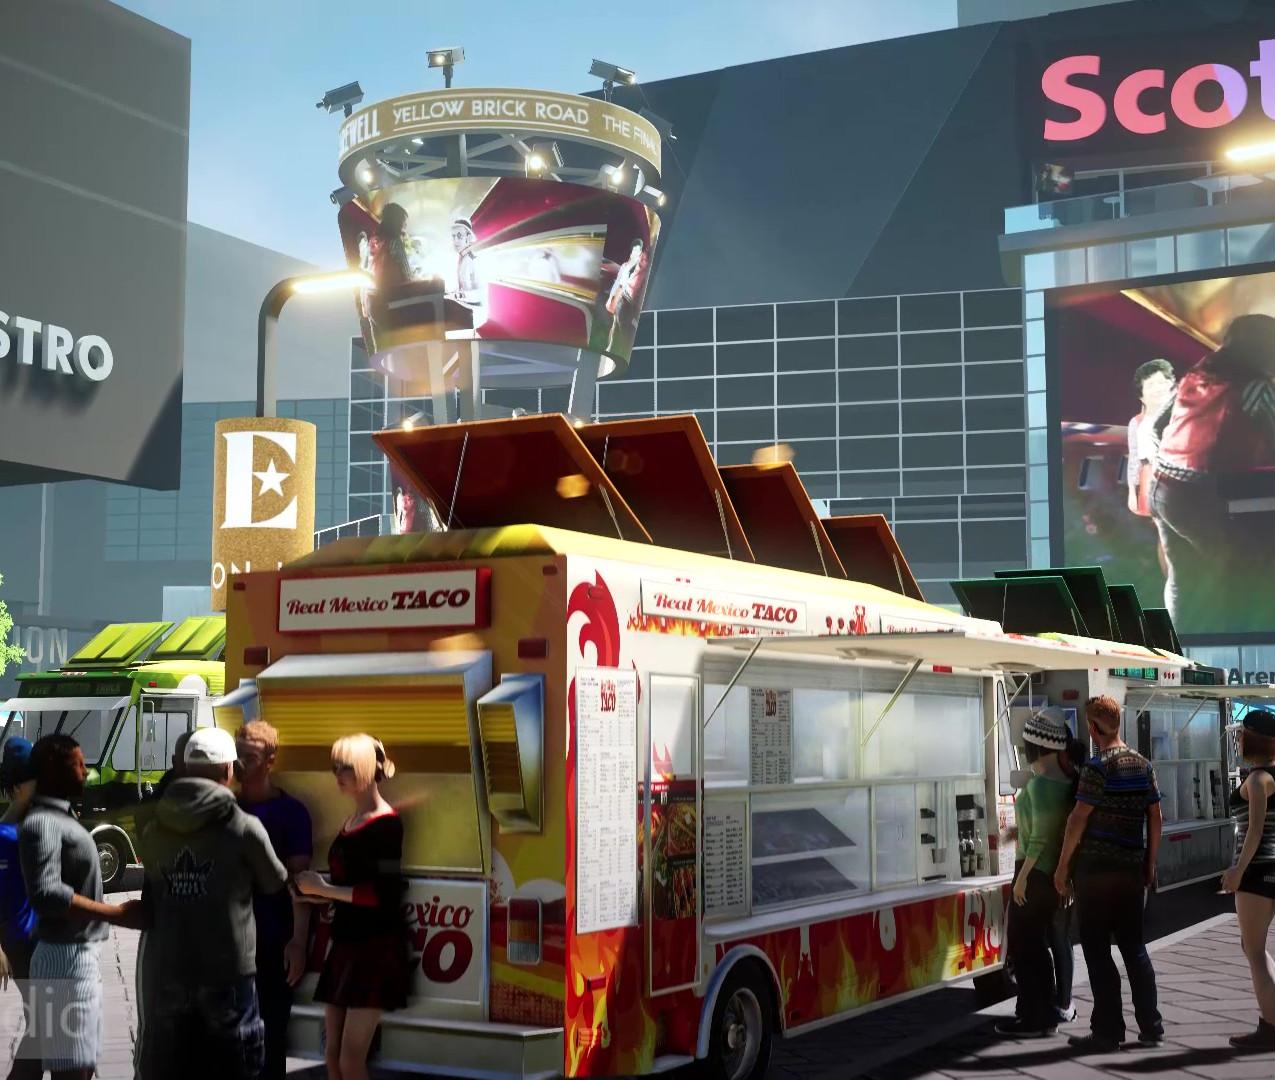 3D rendering arena 006 in front of arena